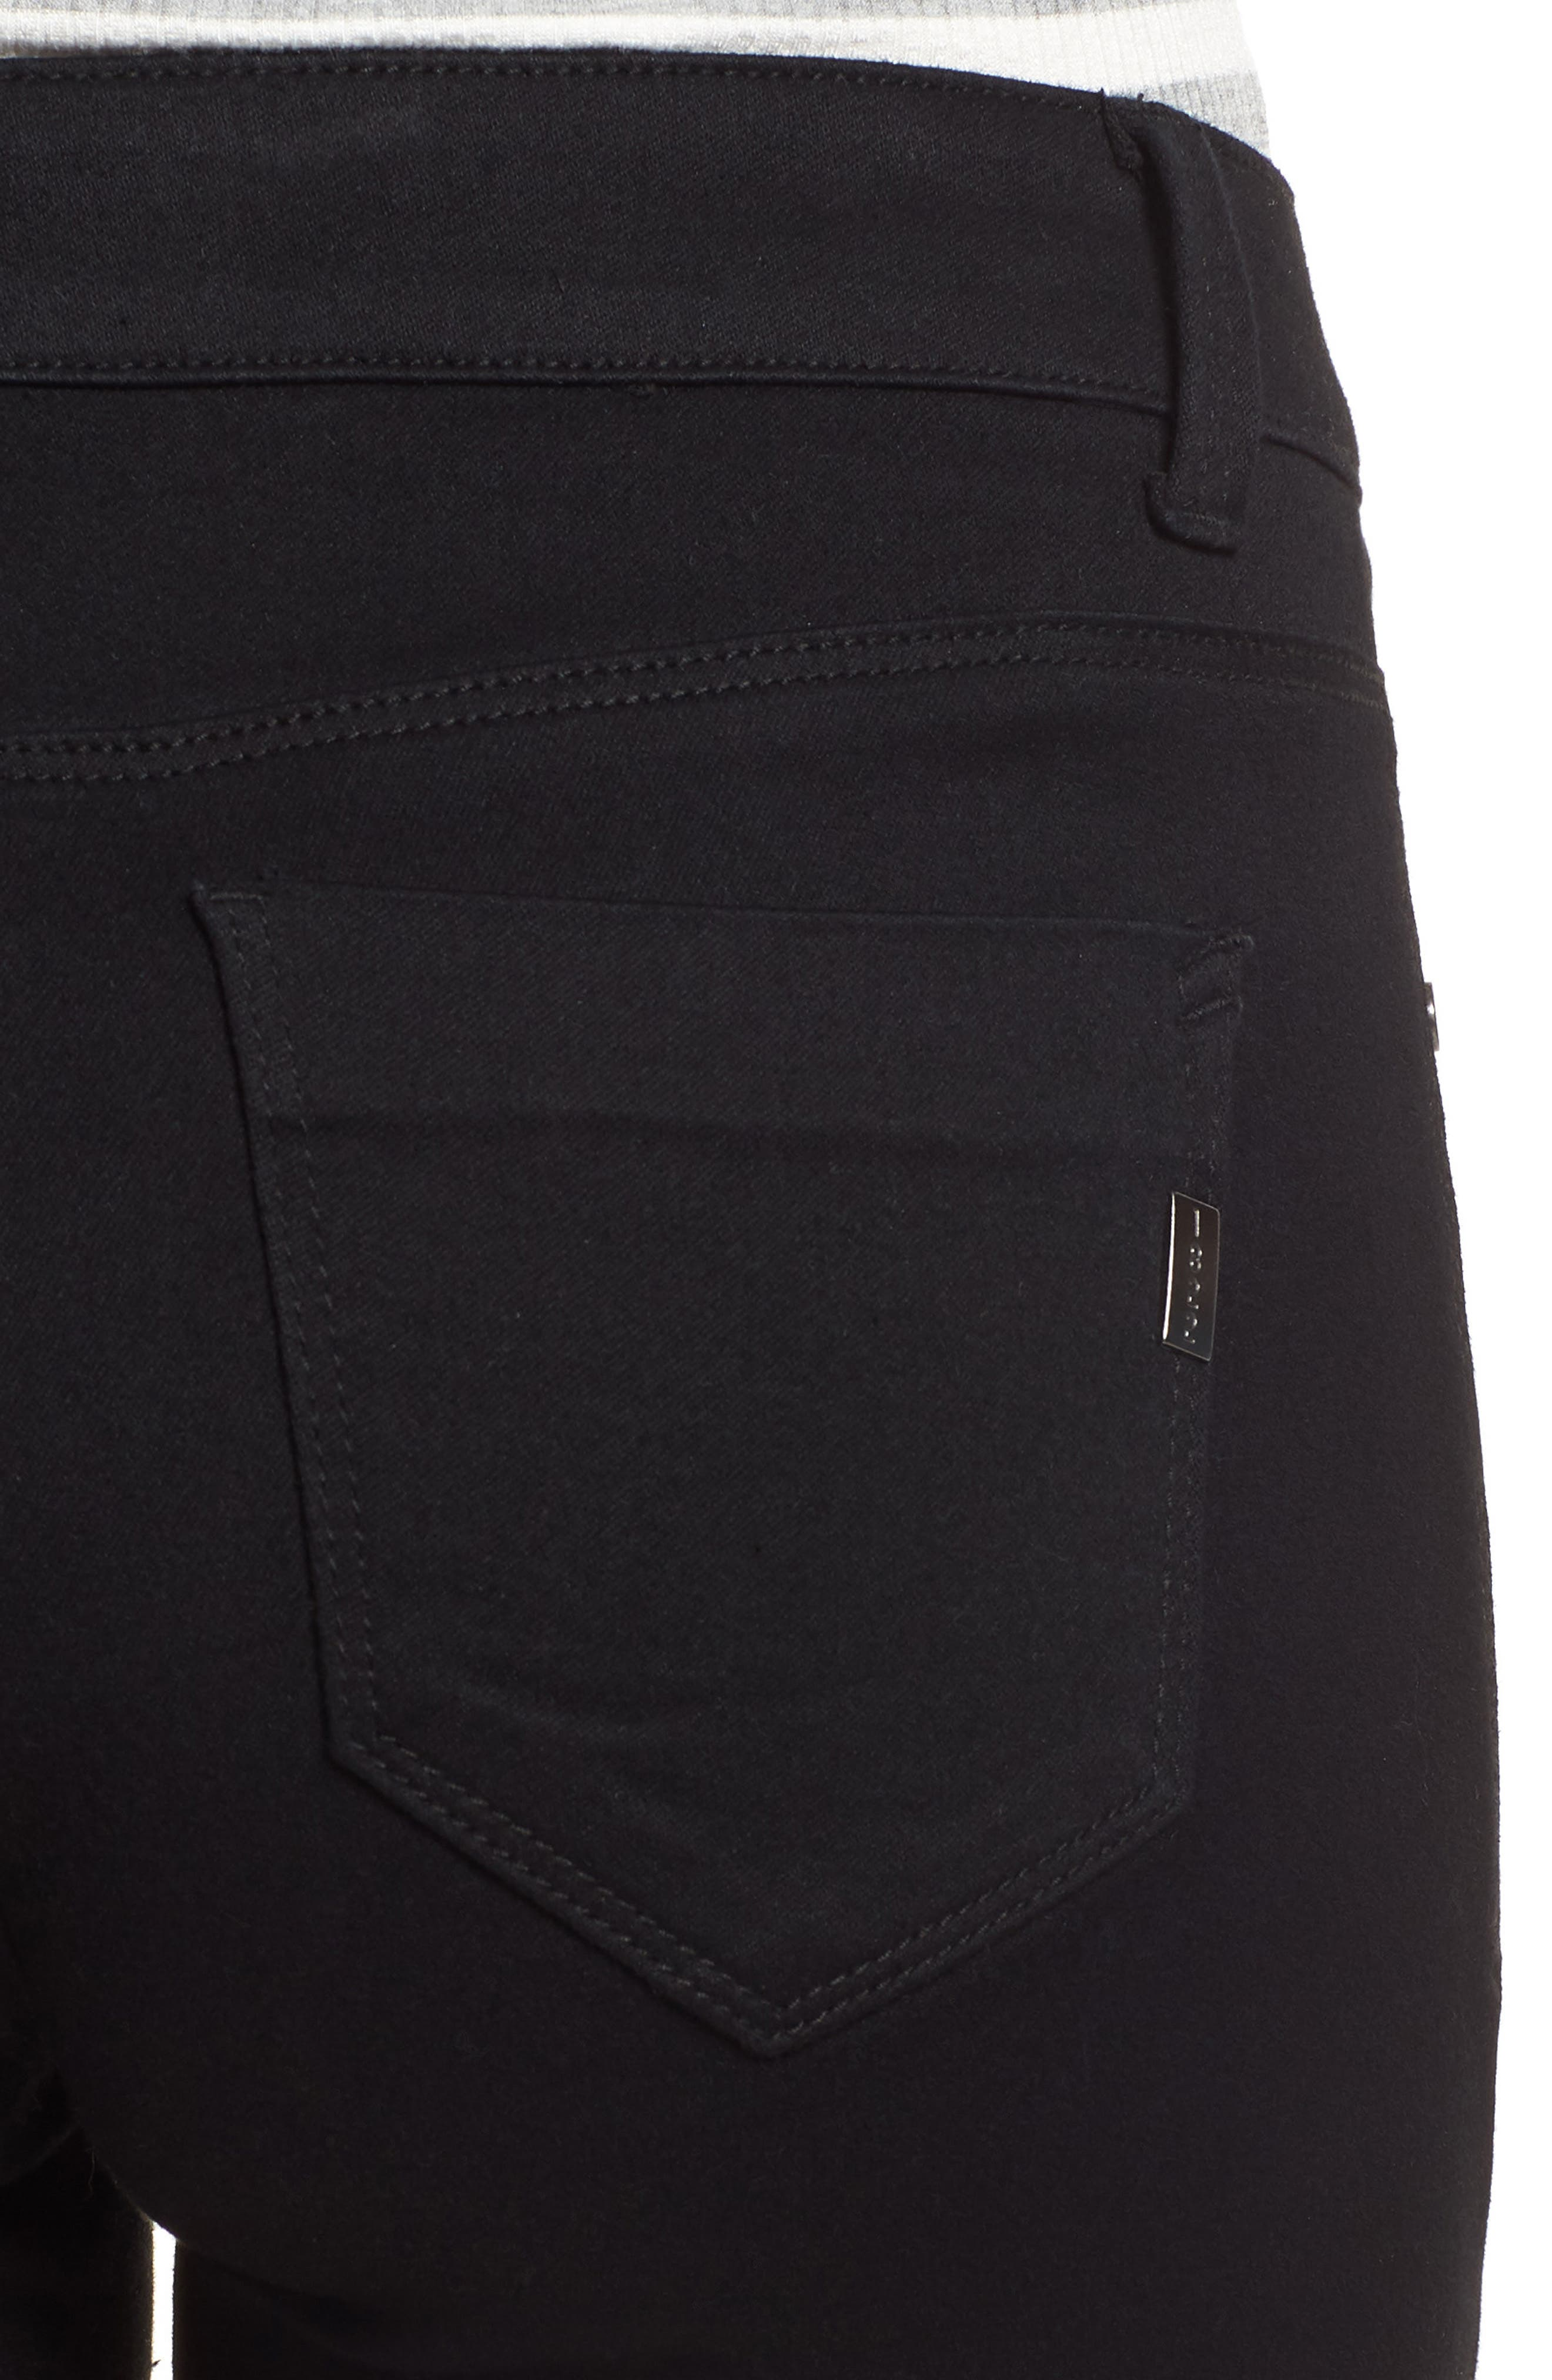 Butter Denim Shorts,                             Alternate thumbnail 4, color,                             001